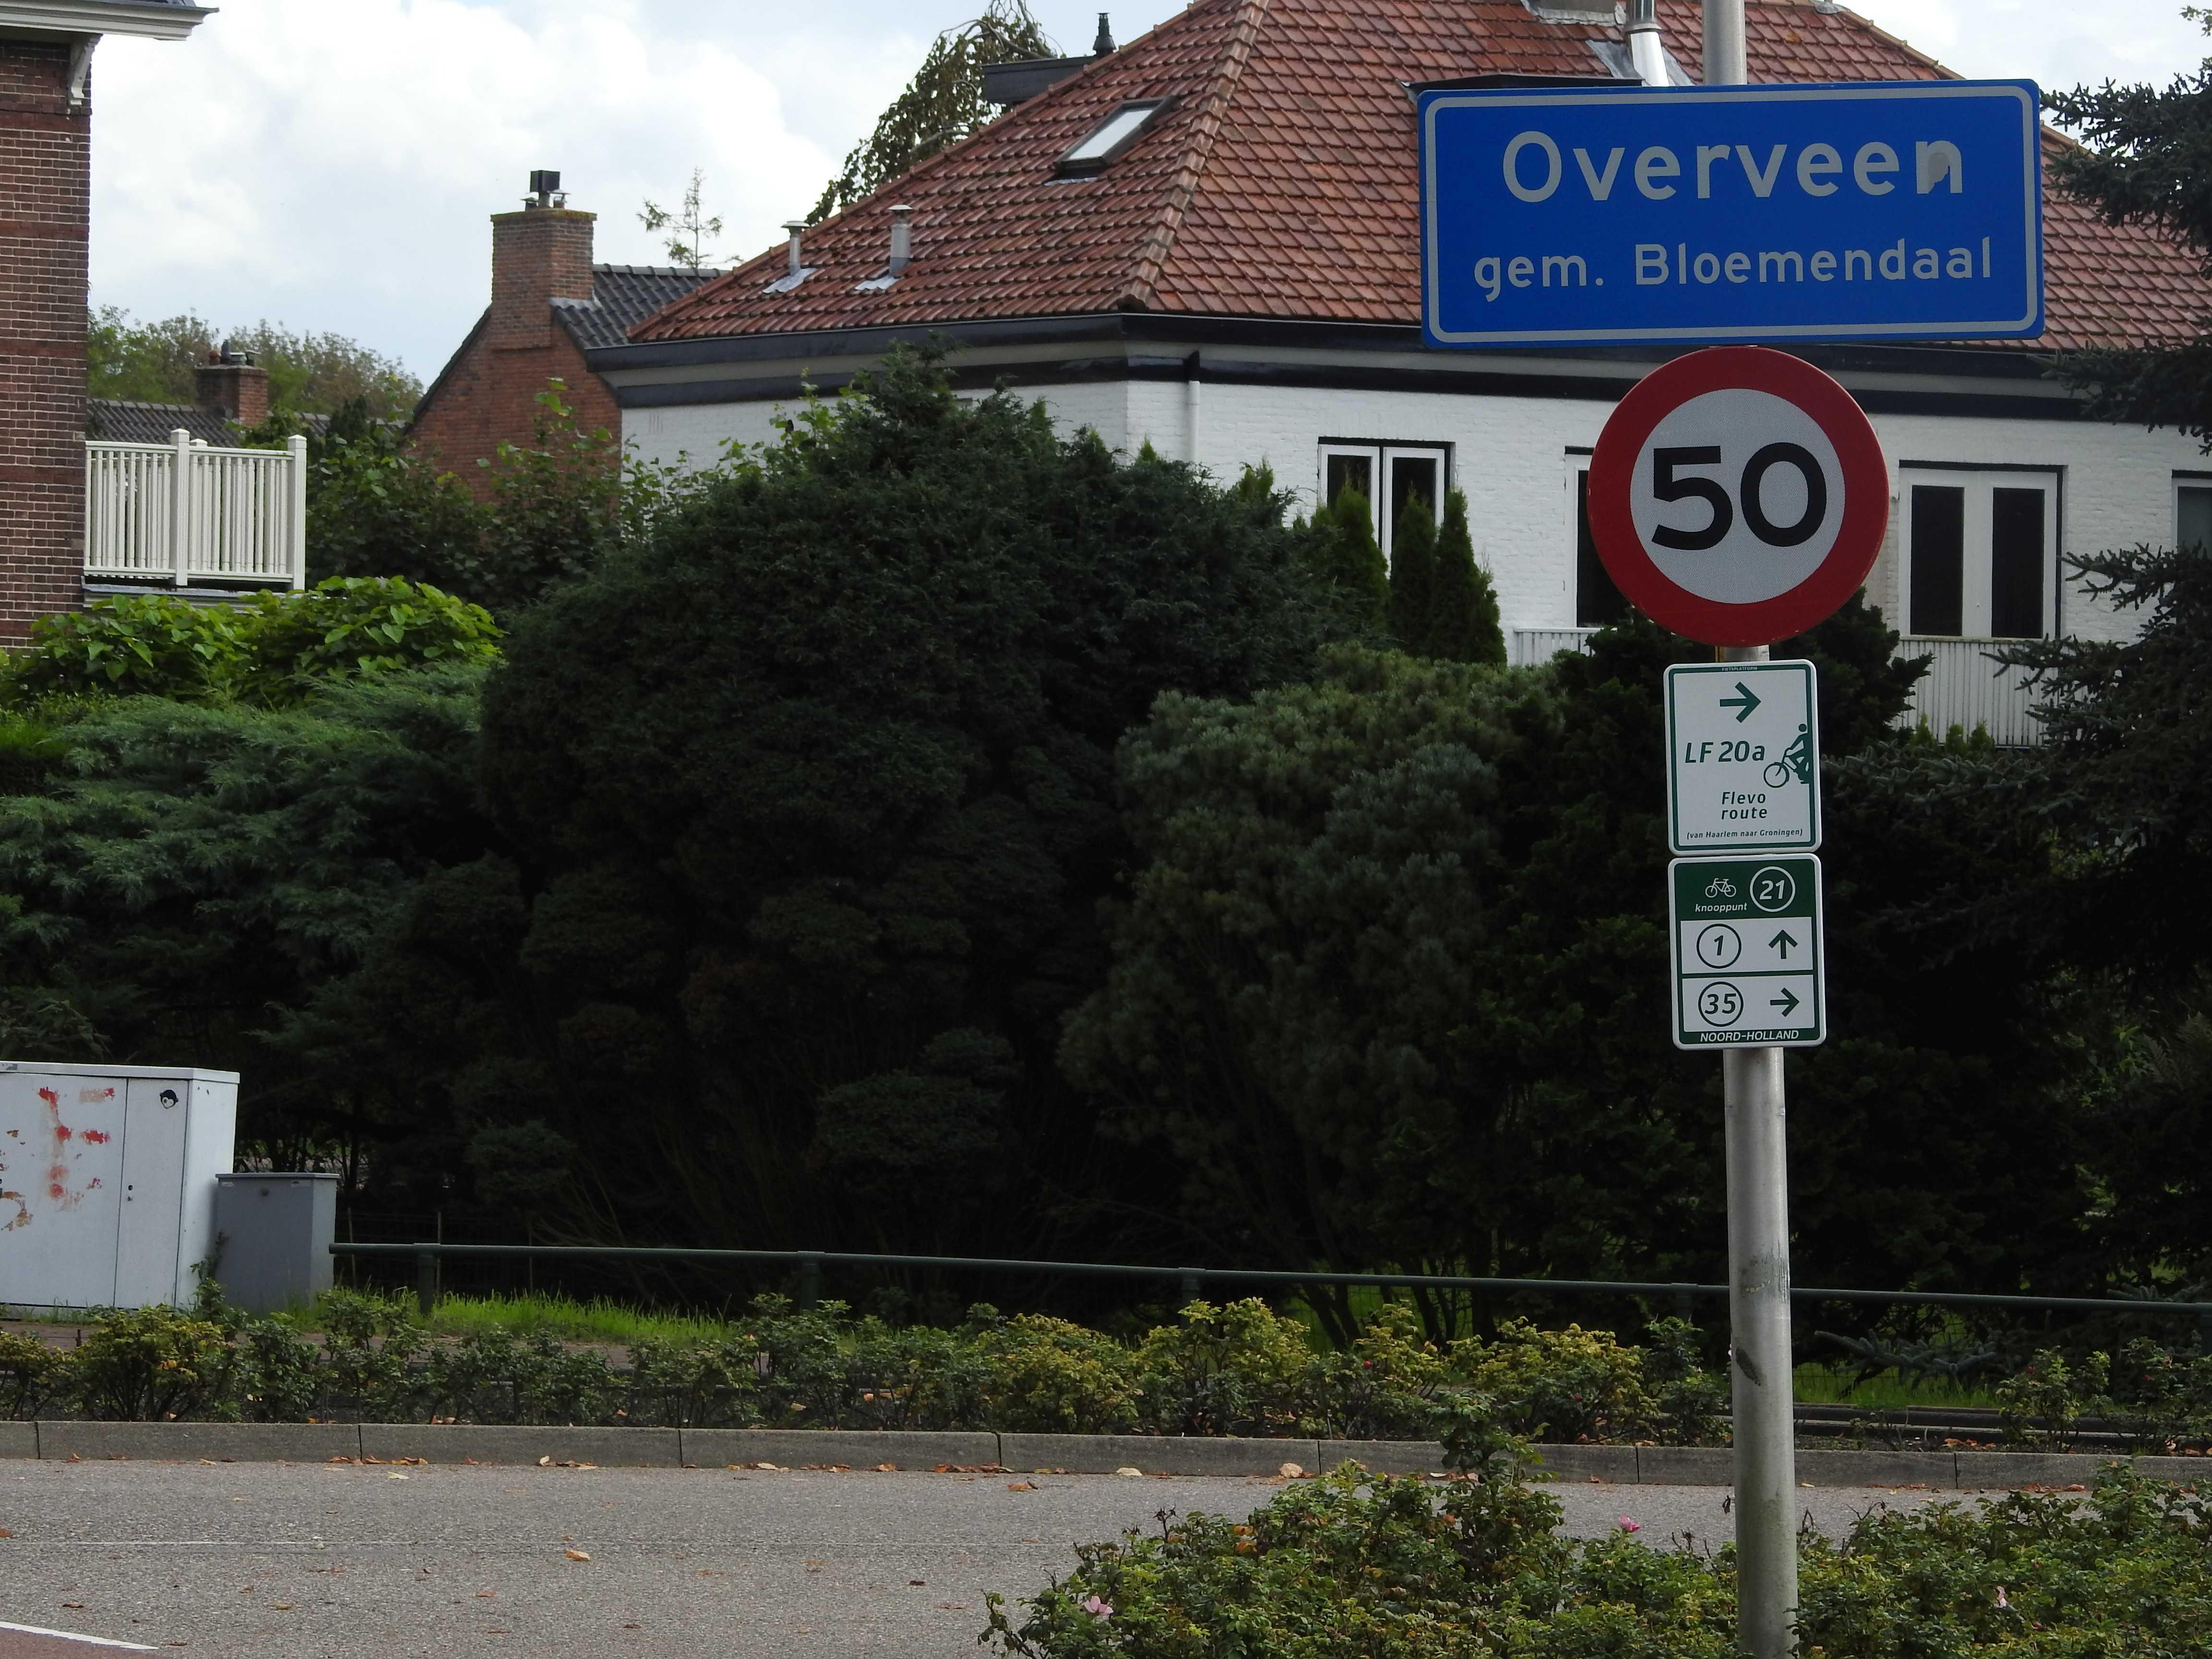 Overveen